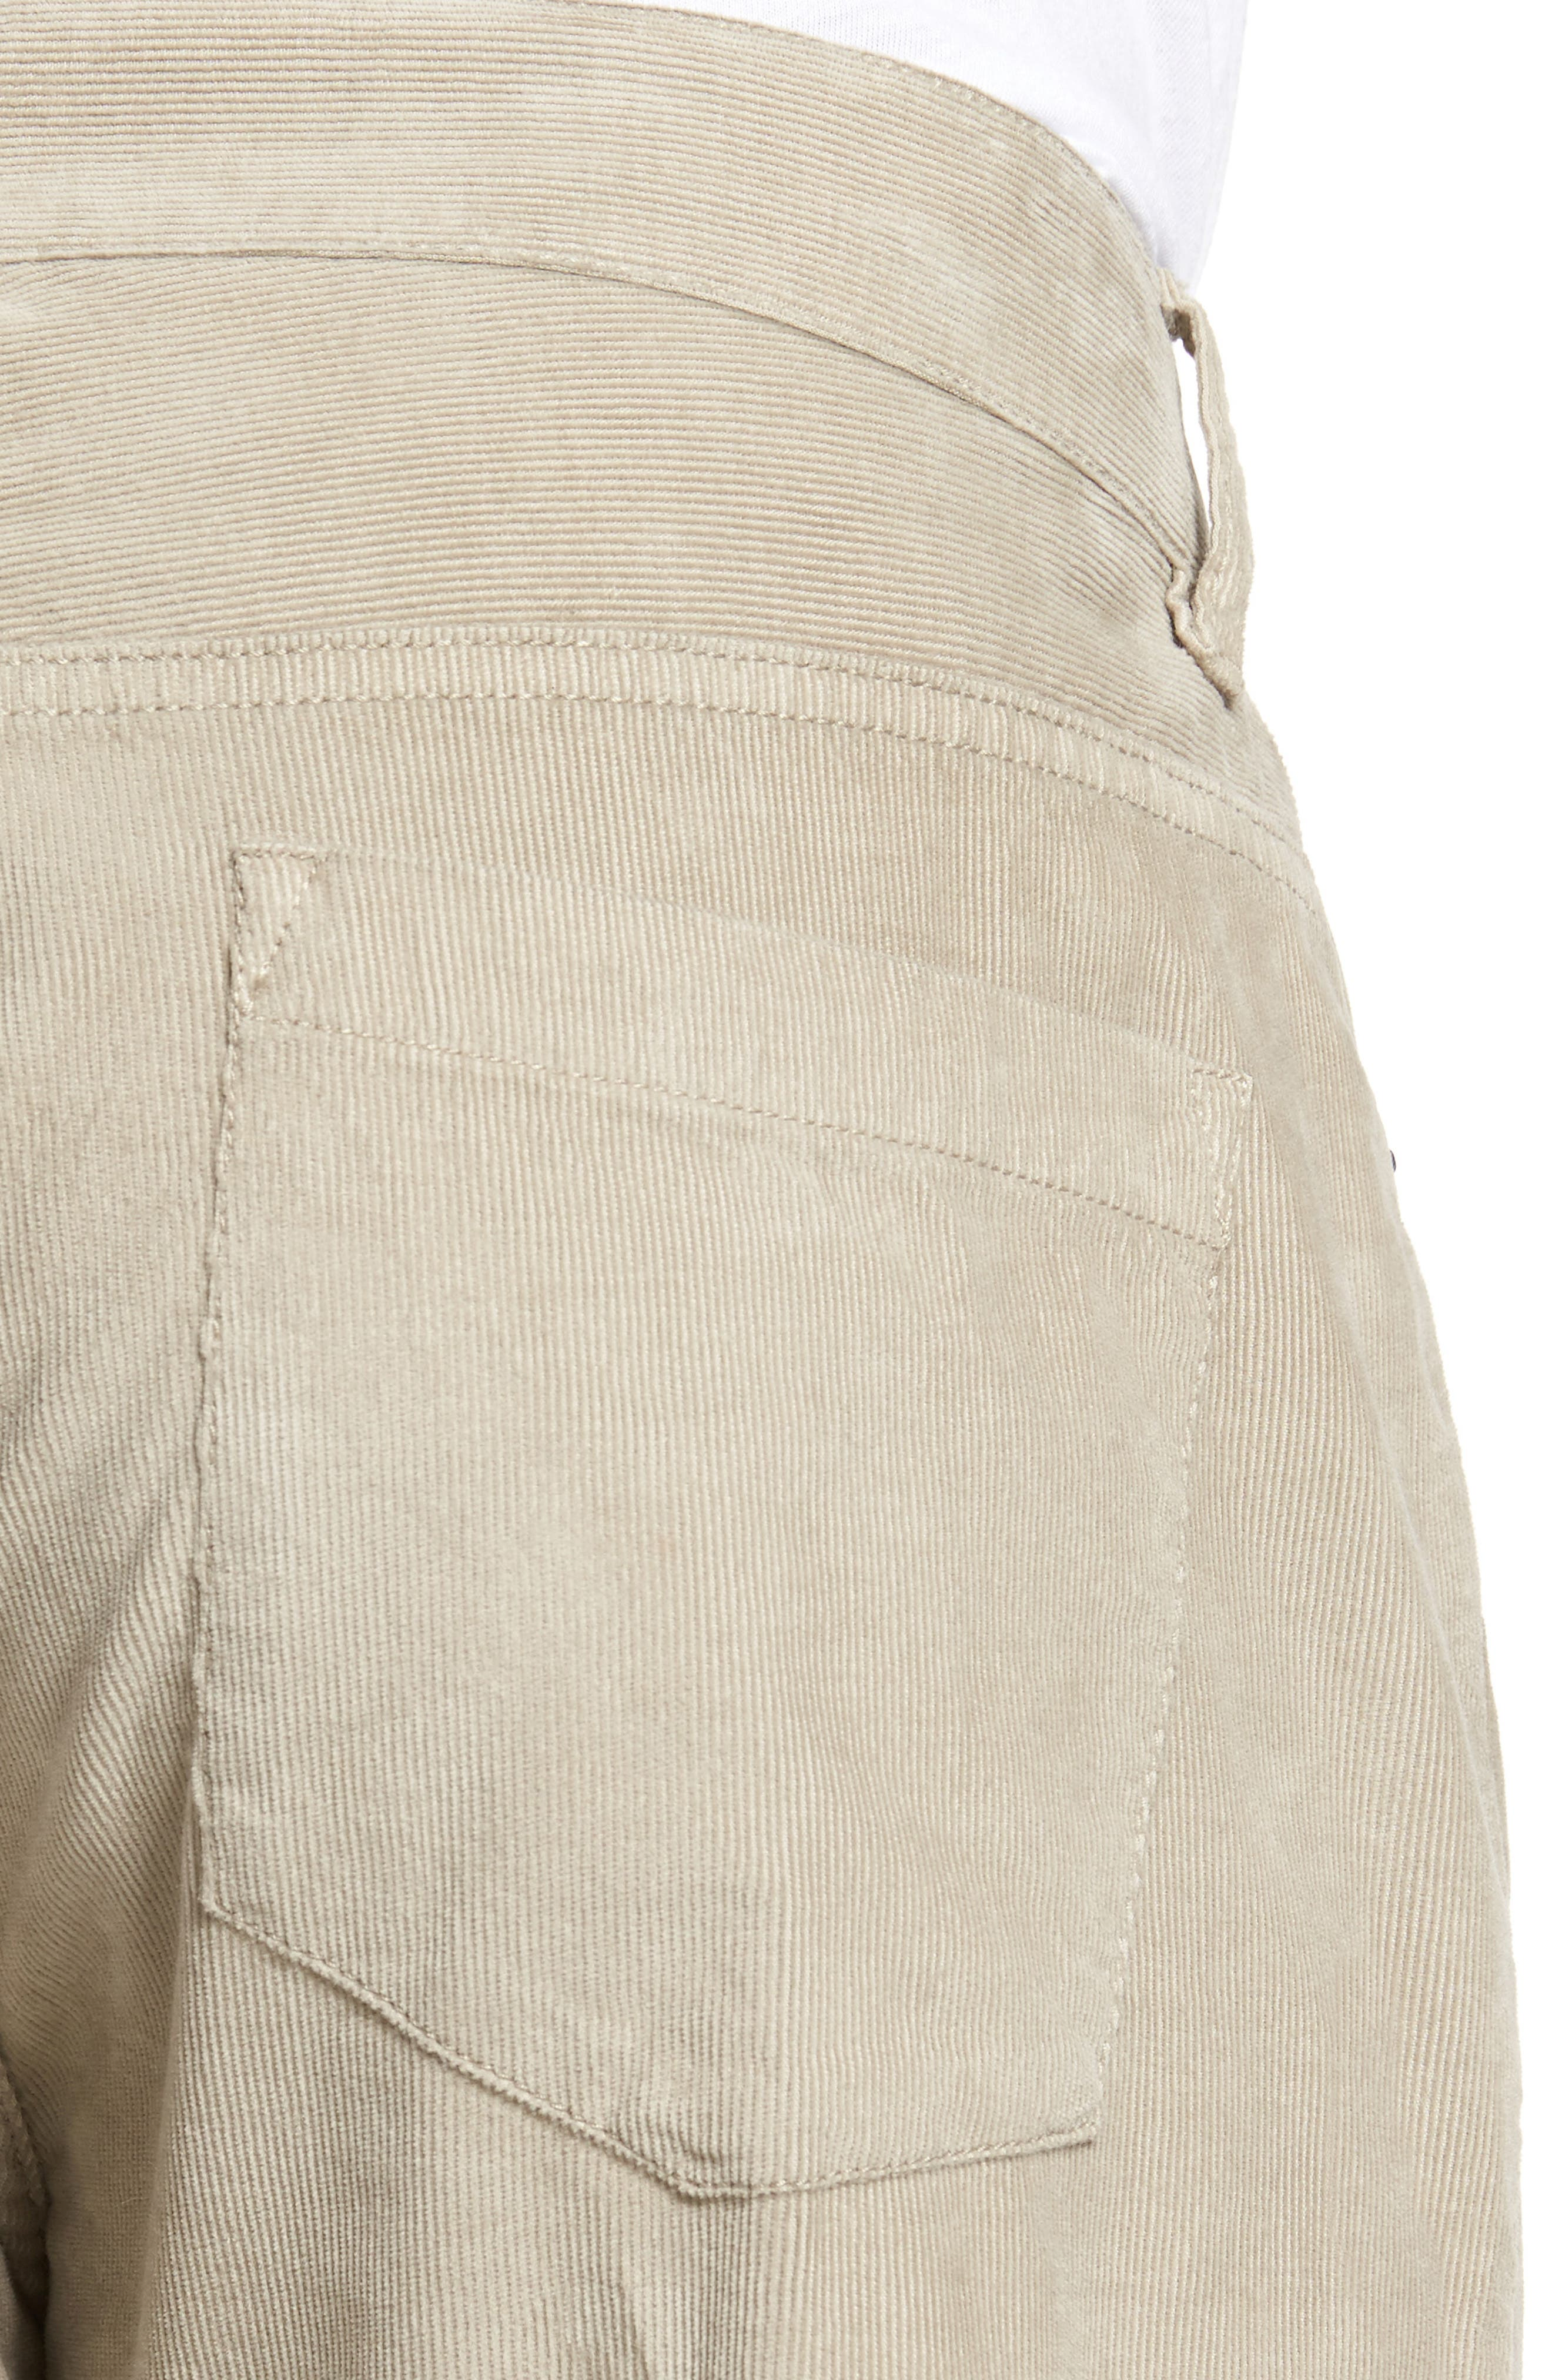 Redonda Stretch Corduroy Trousers,                             Alternate thumbnail 4, color,                             252